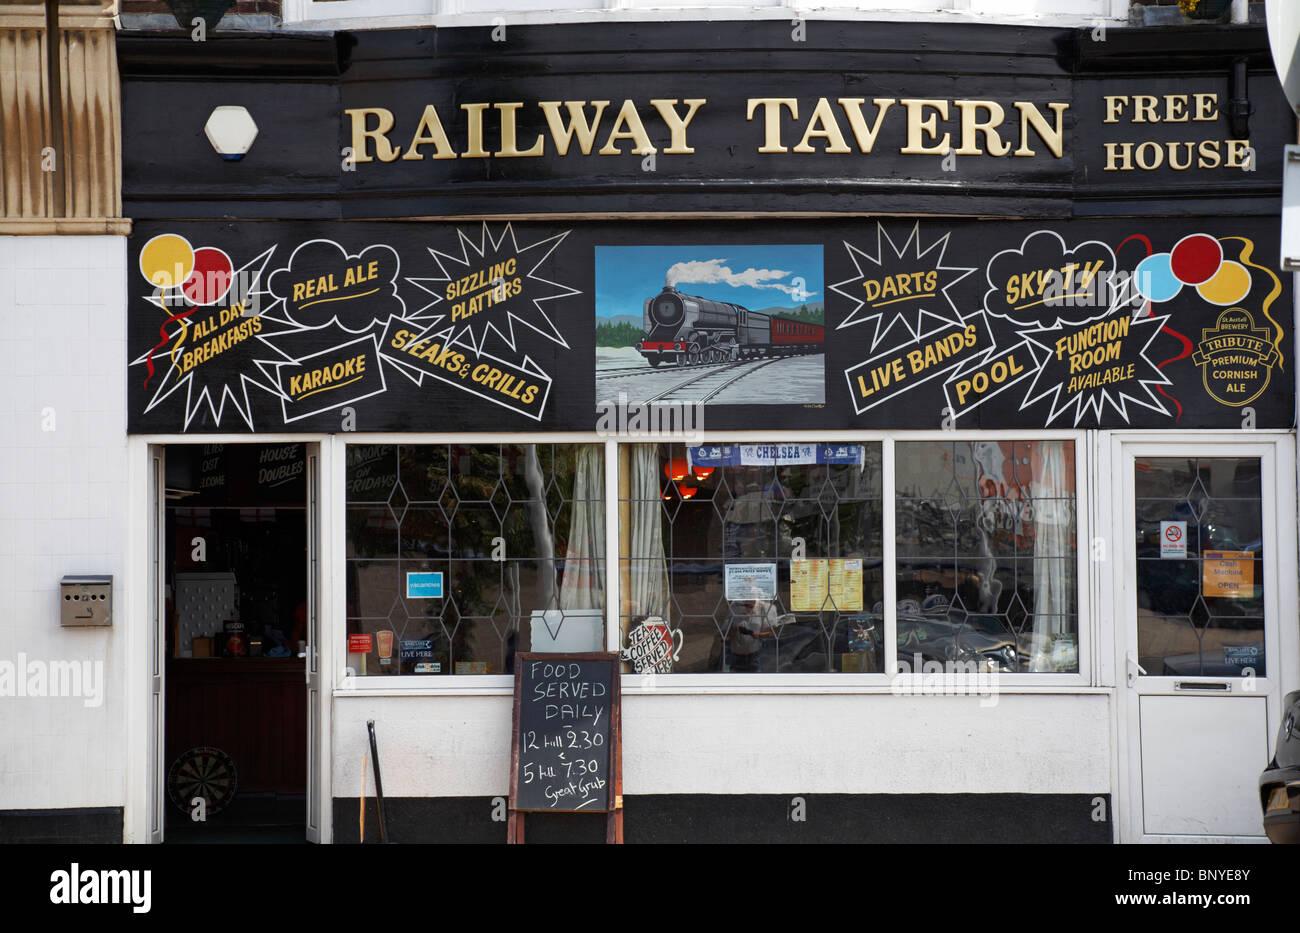 Railway Tavern Free House at Weymouth, Dorset - Stock Image